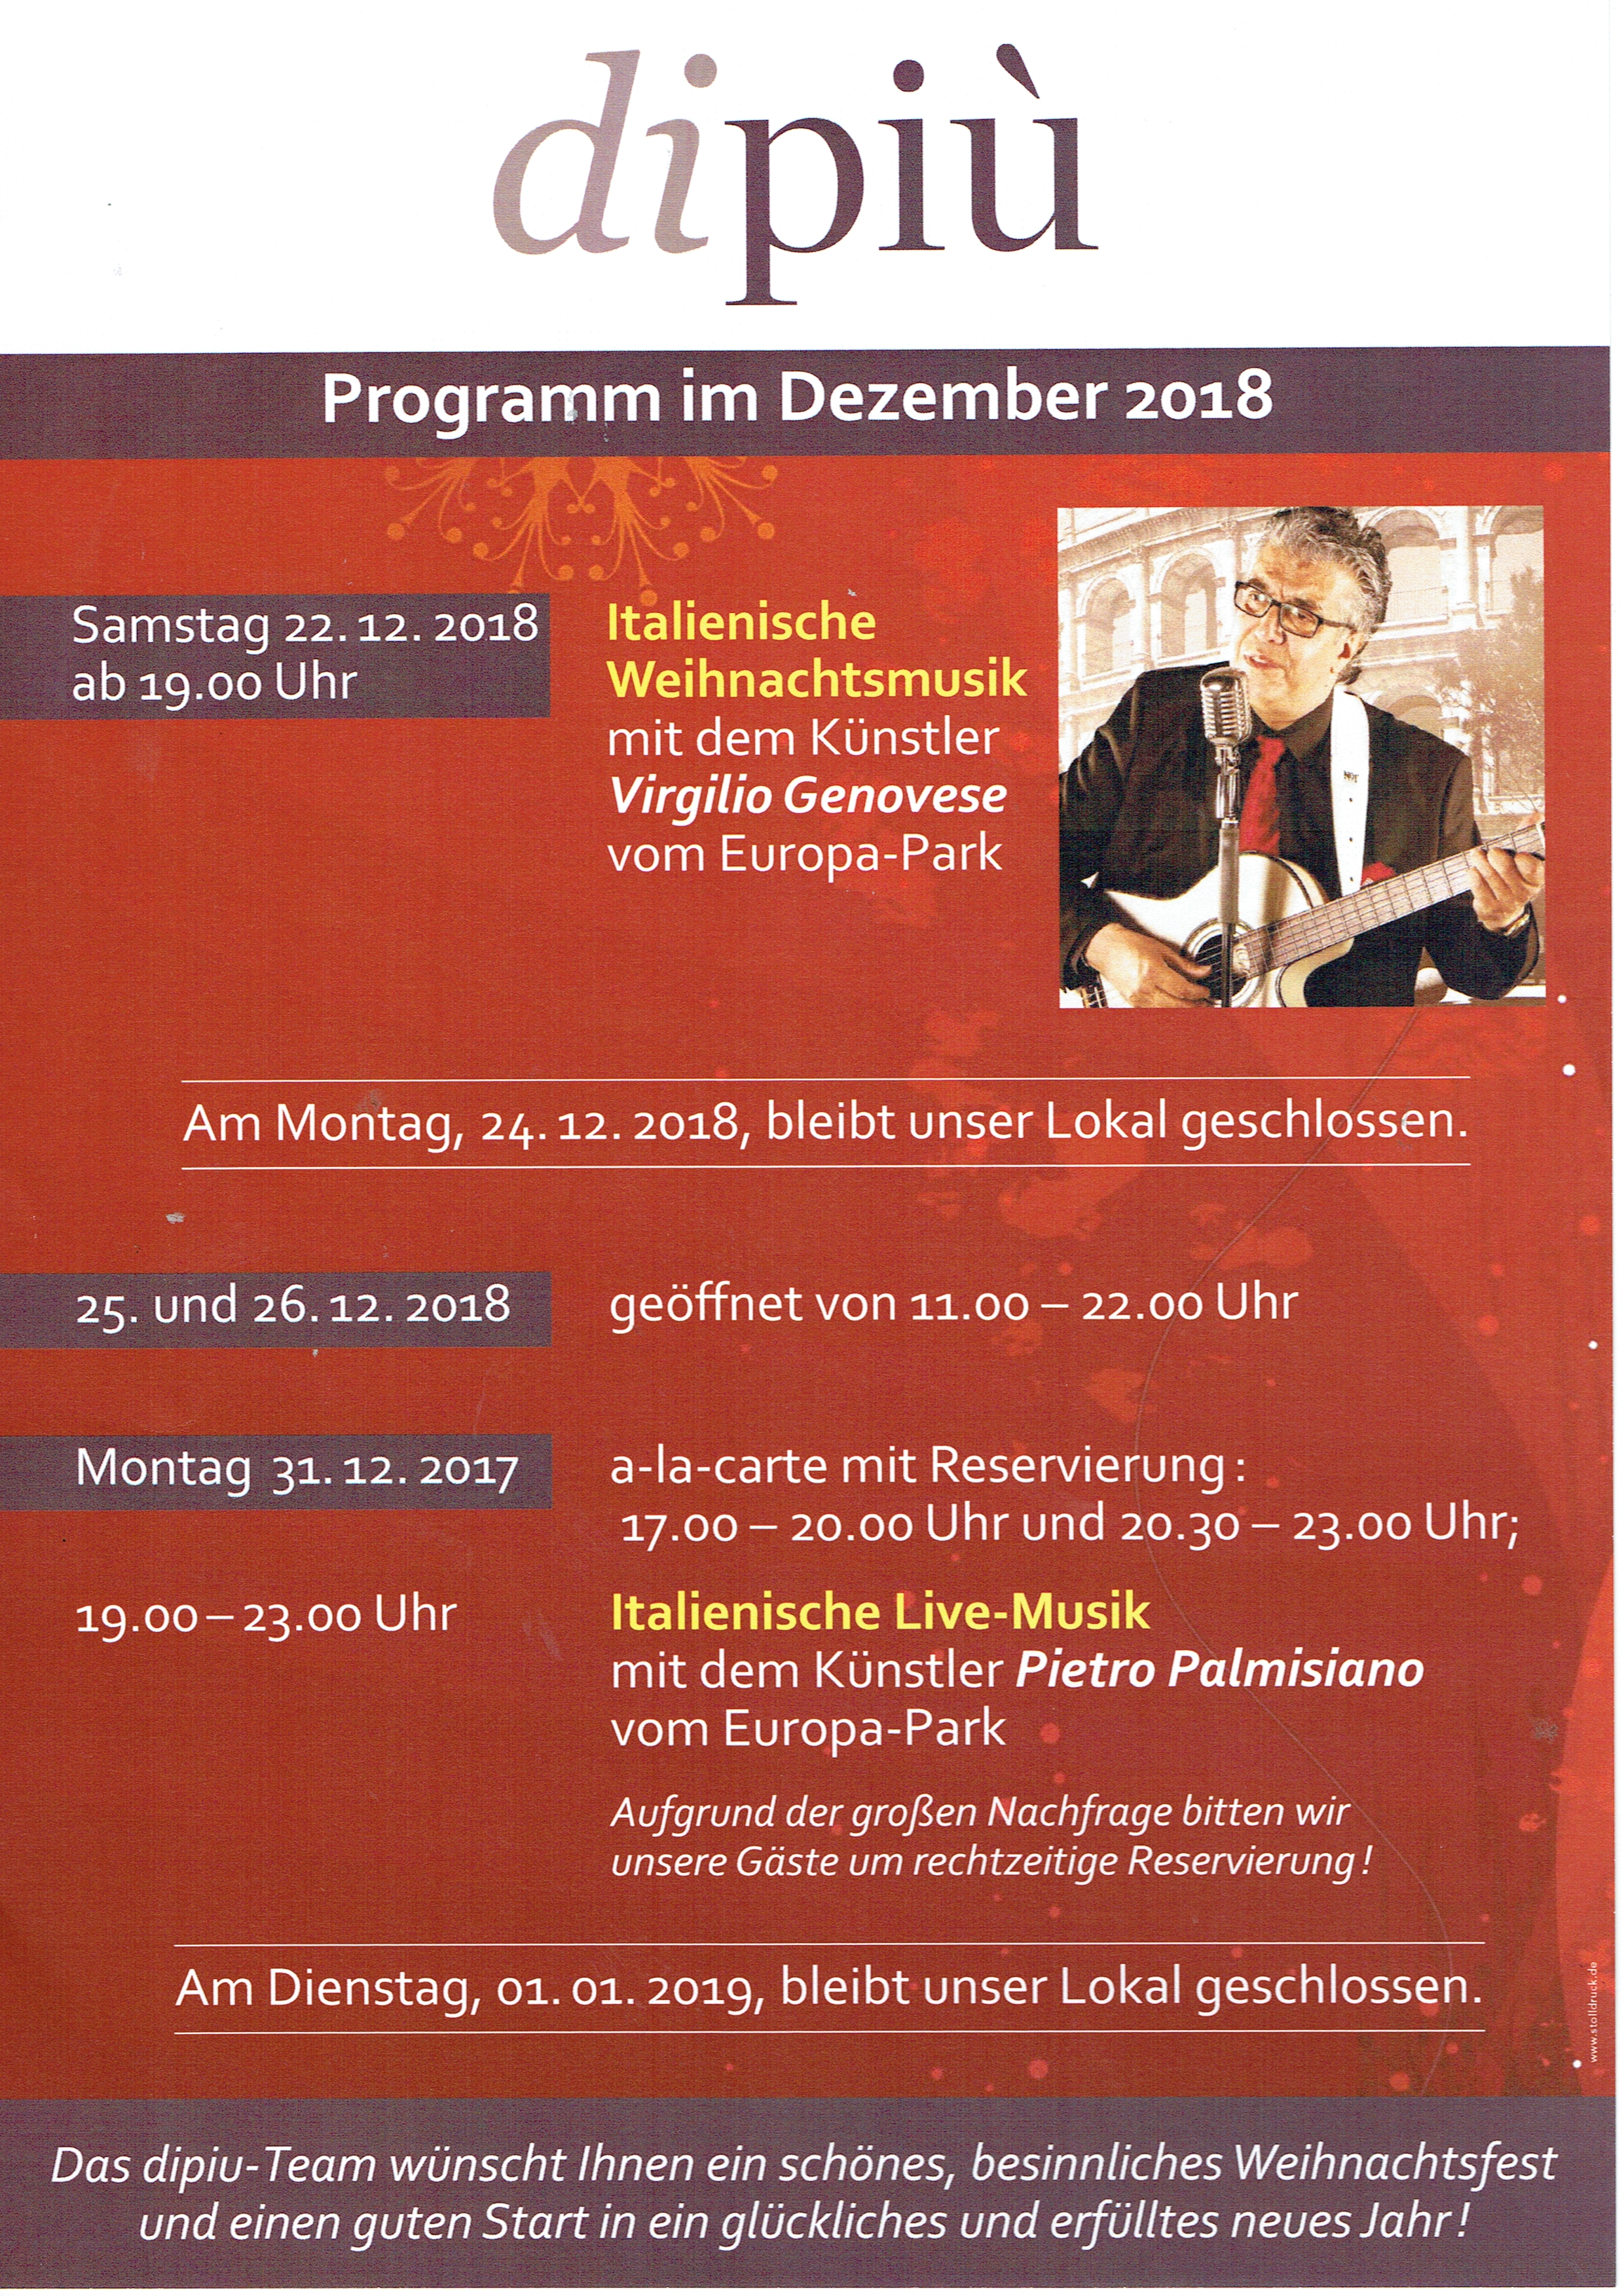 Programm Dezember 2018 dipiu